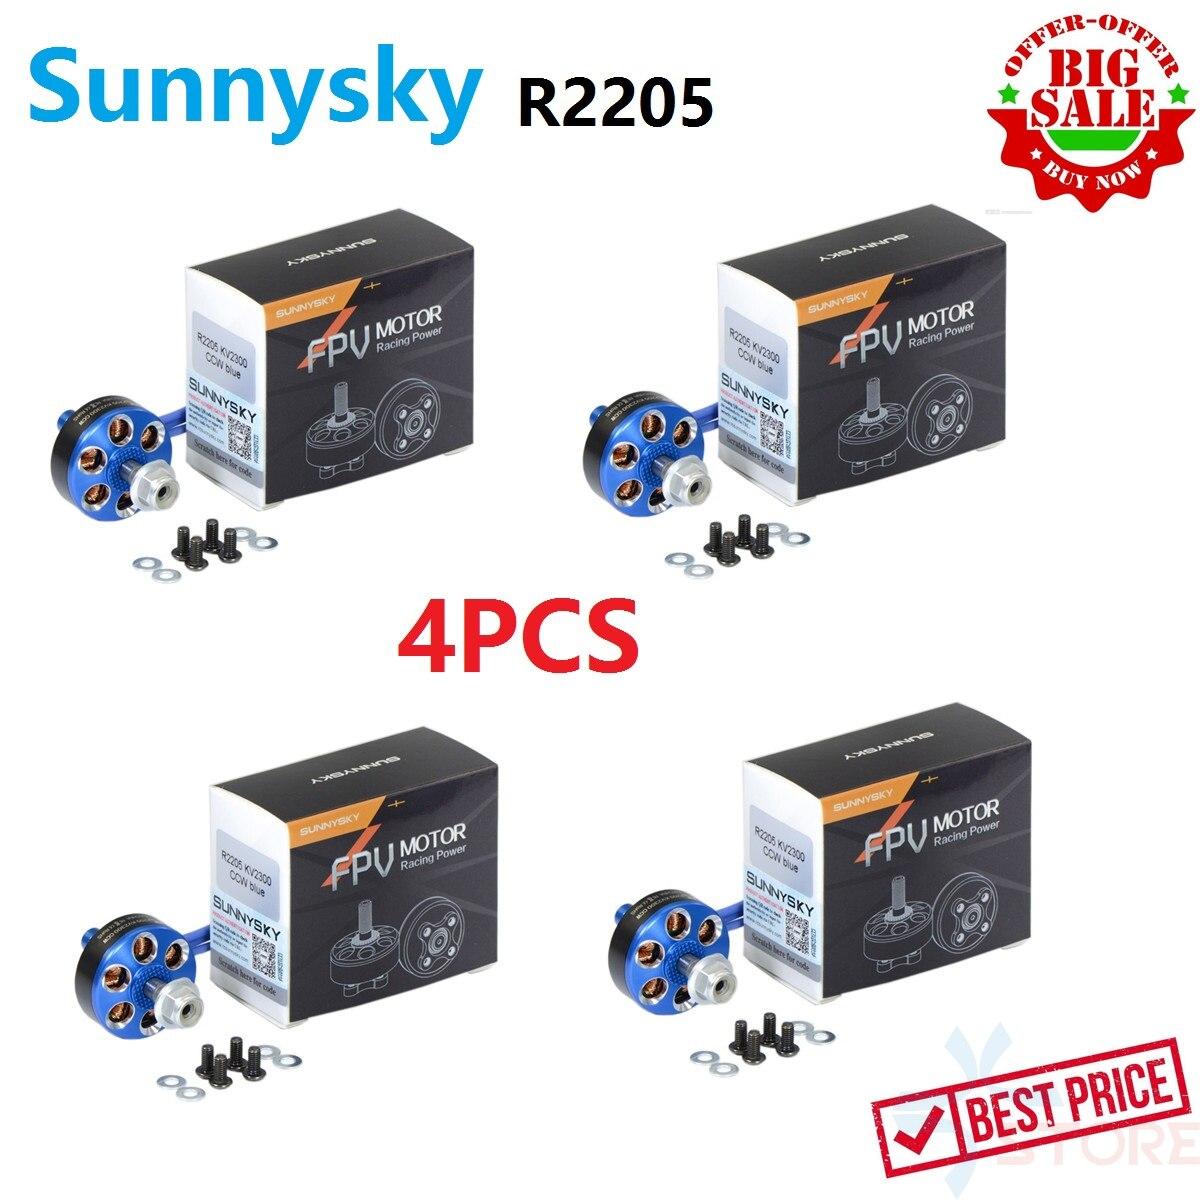 4PCS Sunnysky R2205 2205 2300KV 2500KV Brushless Motor CW CCW For RC Drone FPV Racing Multi Rotor Quadcopter